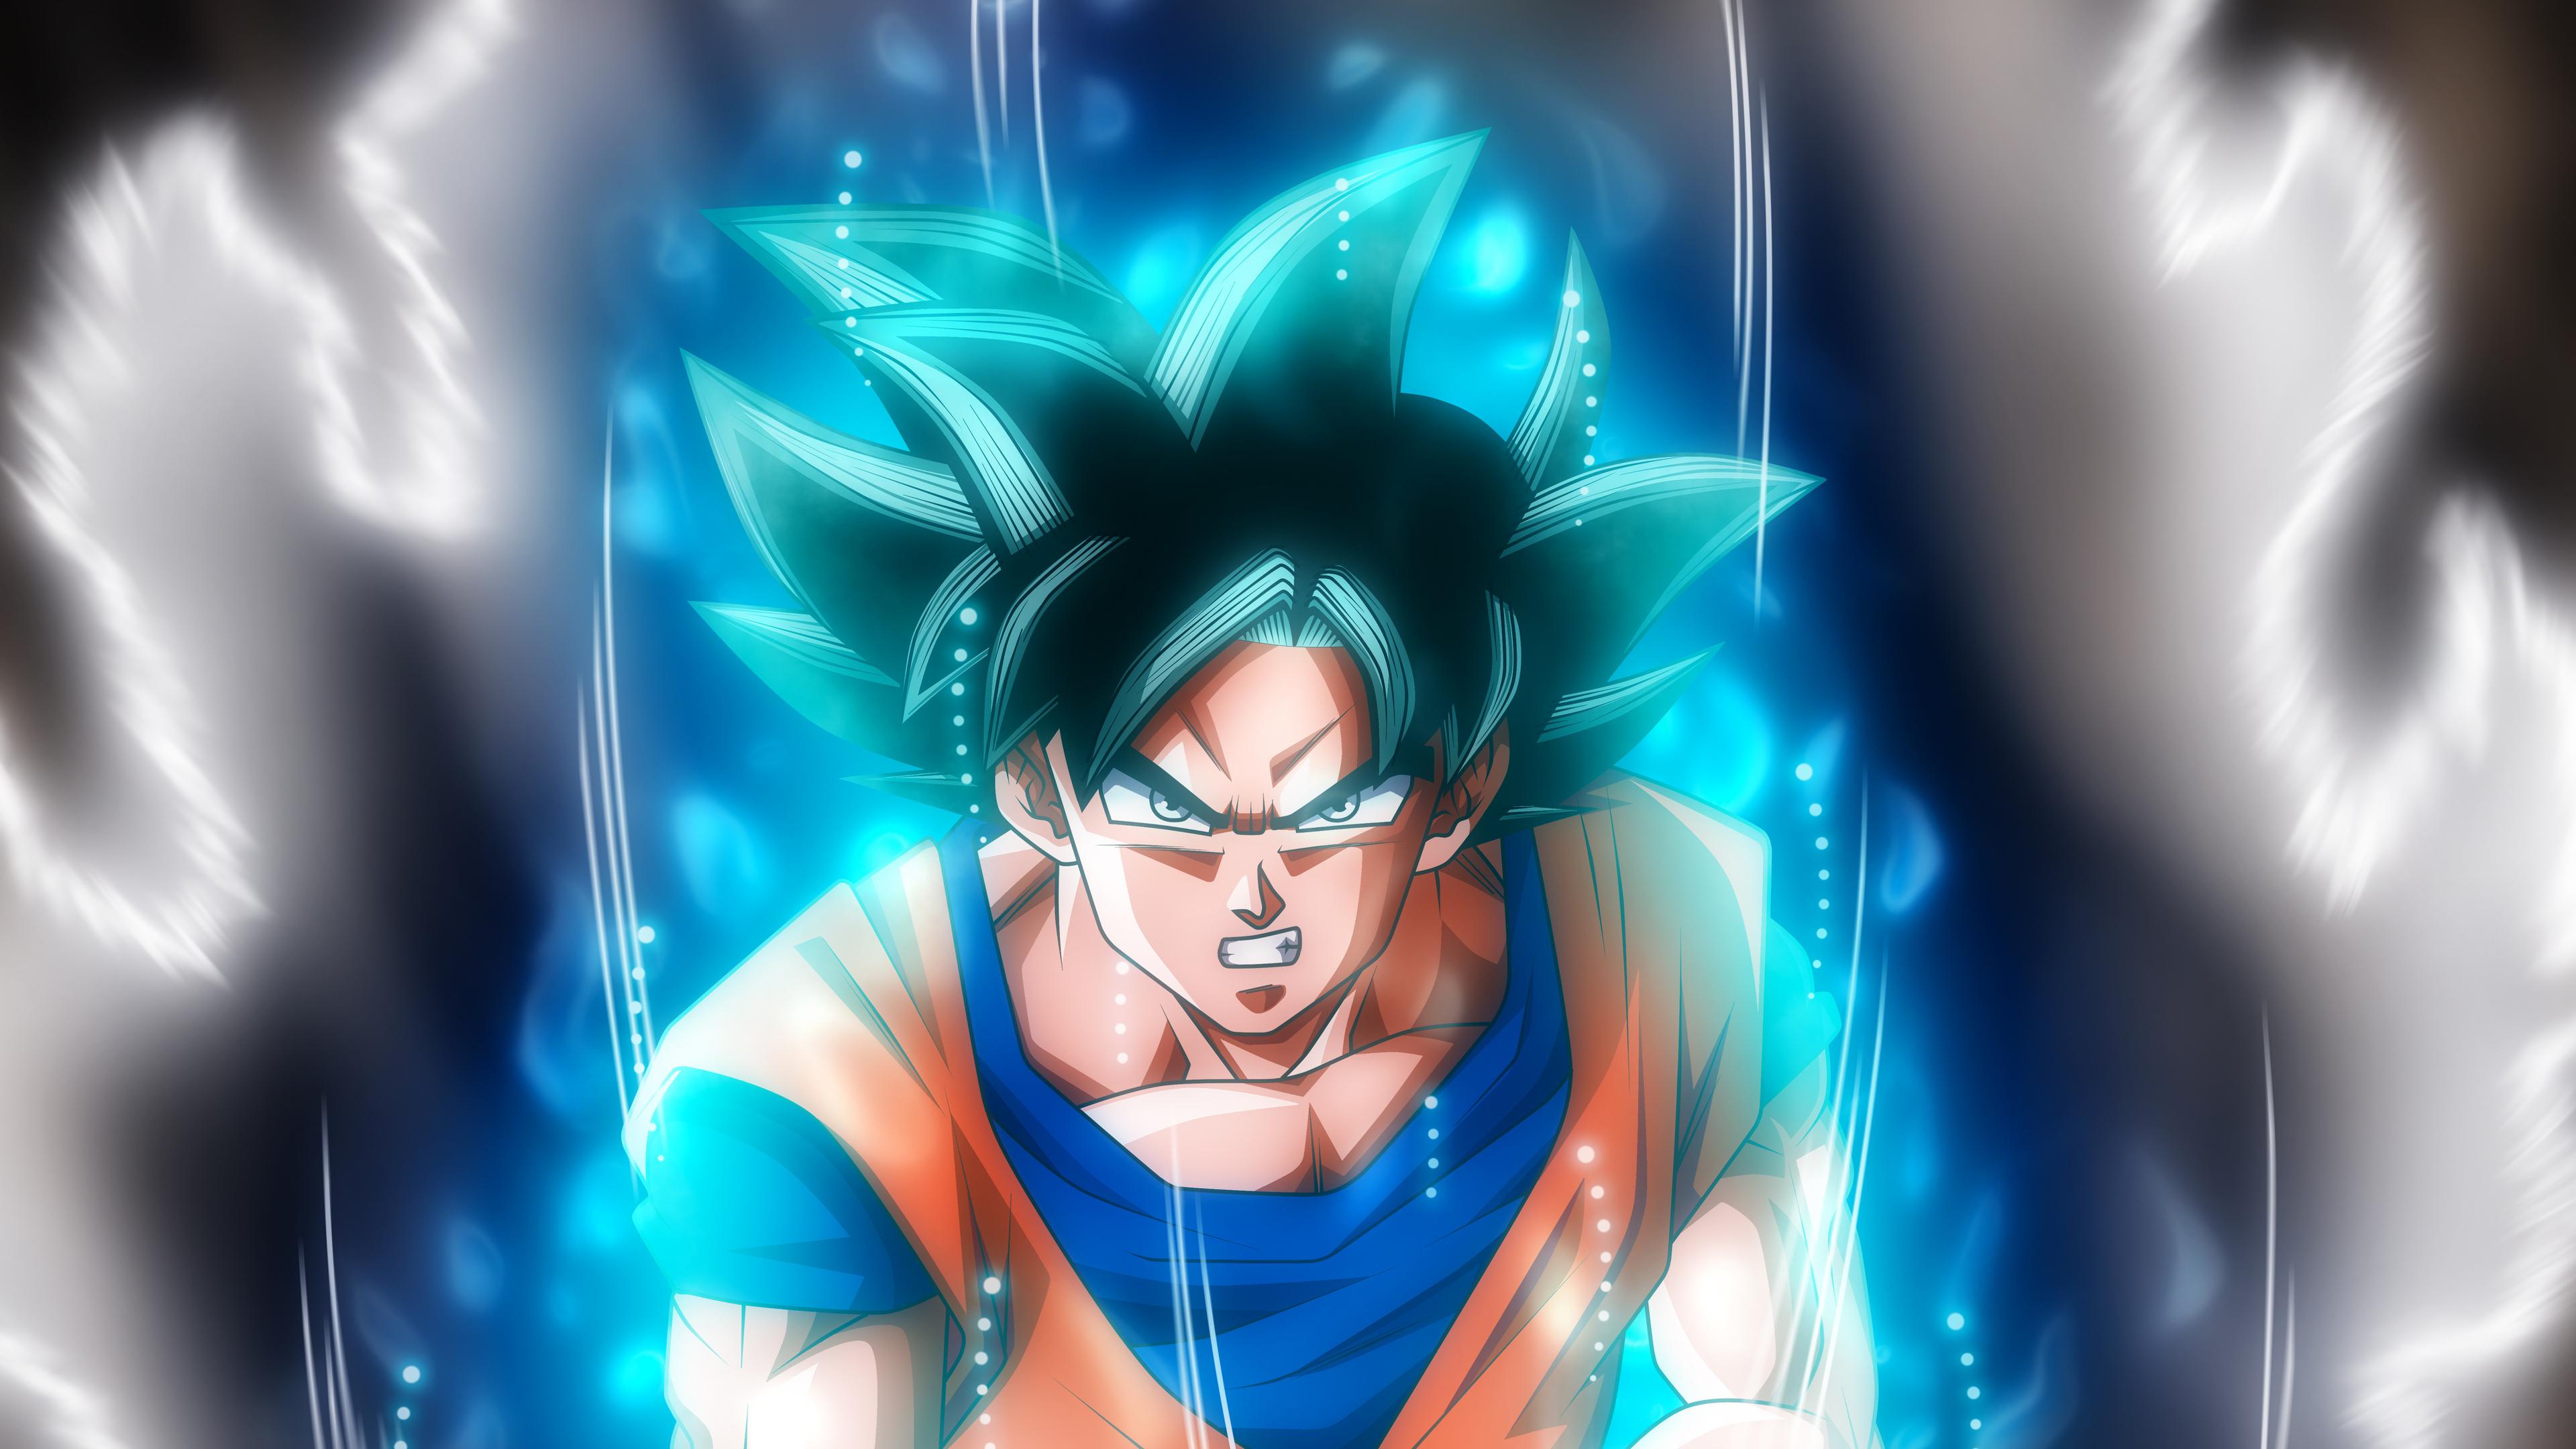 3840x2160 Goku Ultra Instinct Dragon Ball 5k 4k HD 4k ...